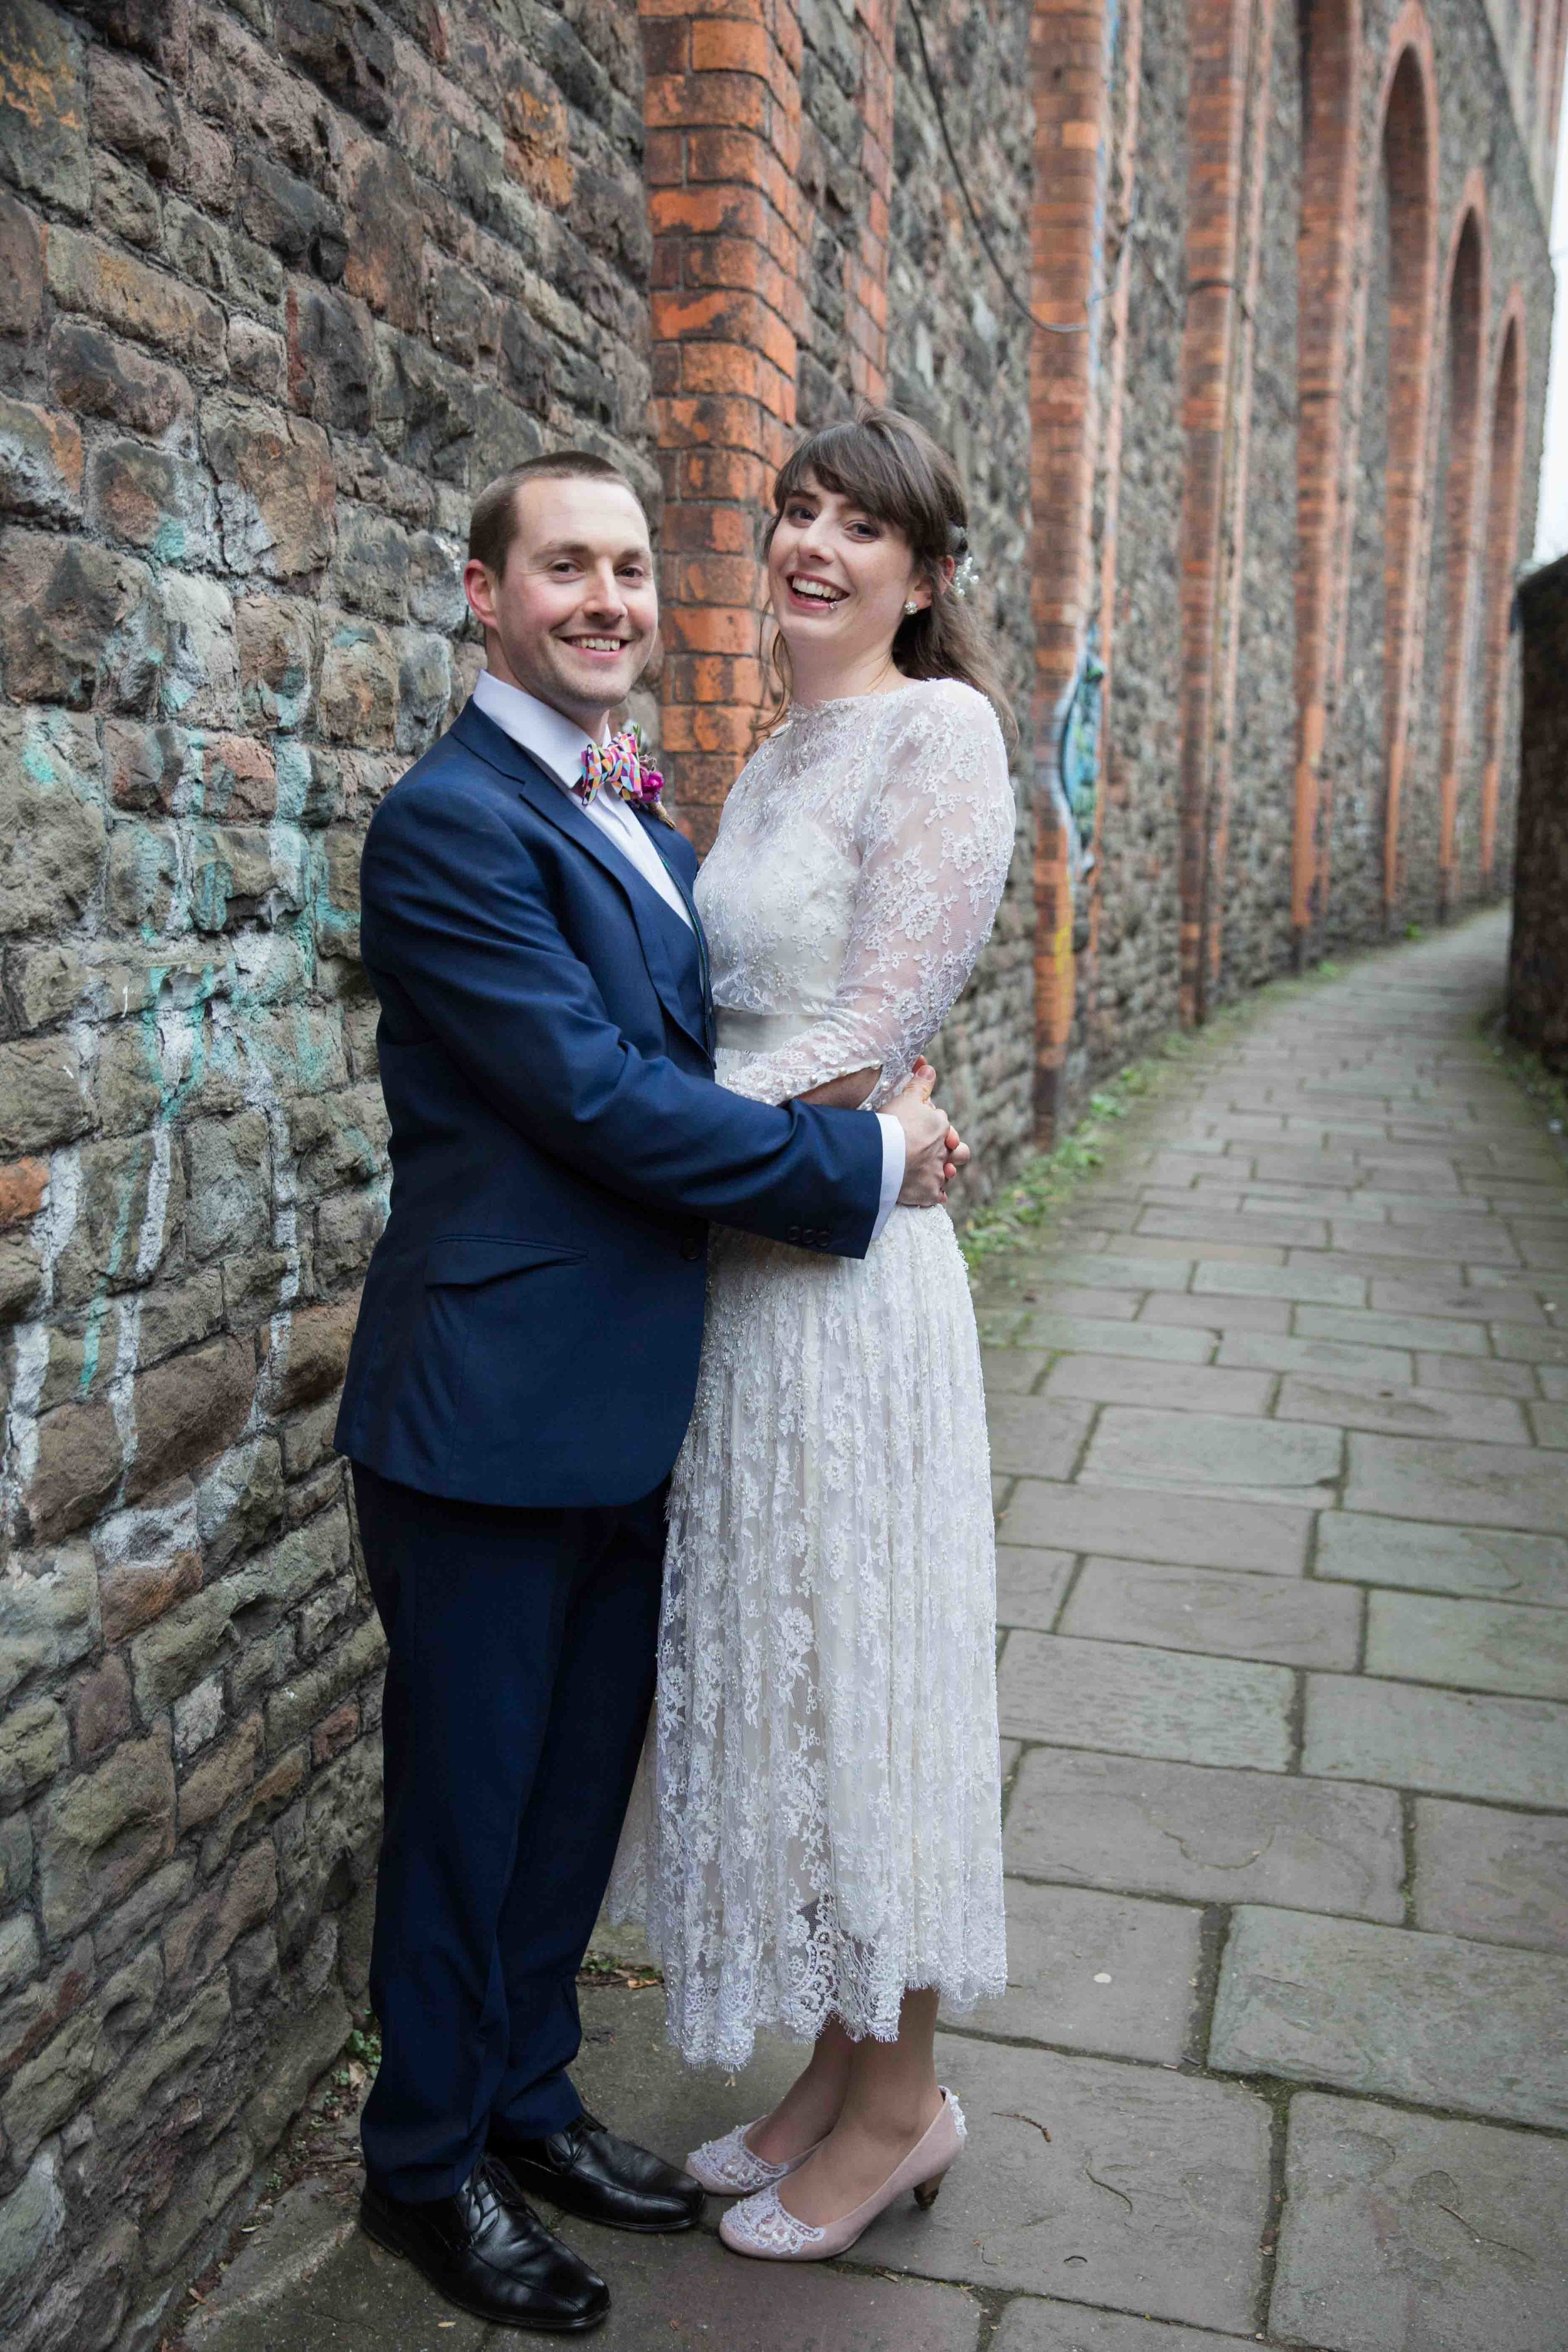 Adam & Faye - Wright Wedding Photography - Bristol Wedding Photographer -294.jpg